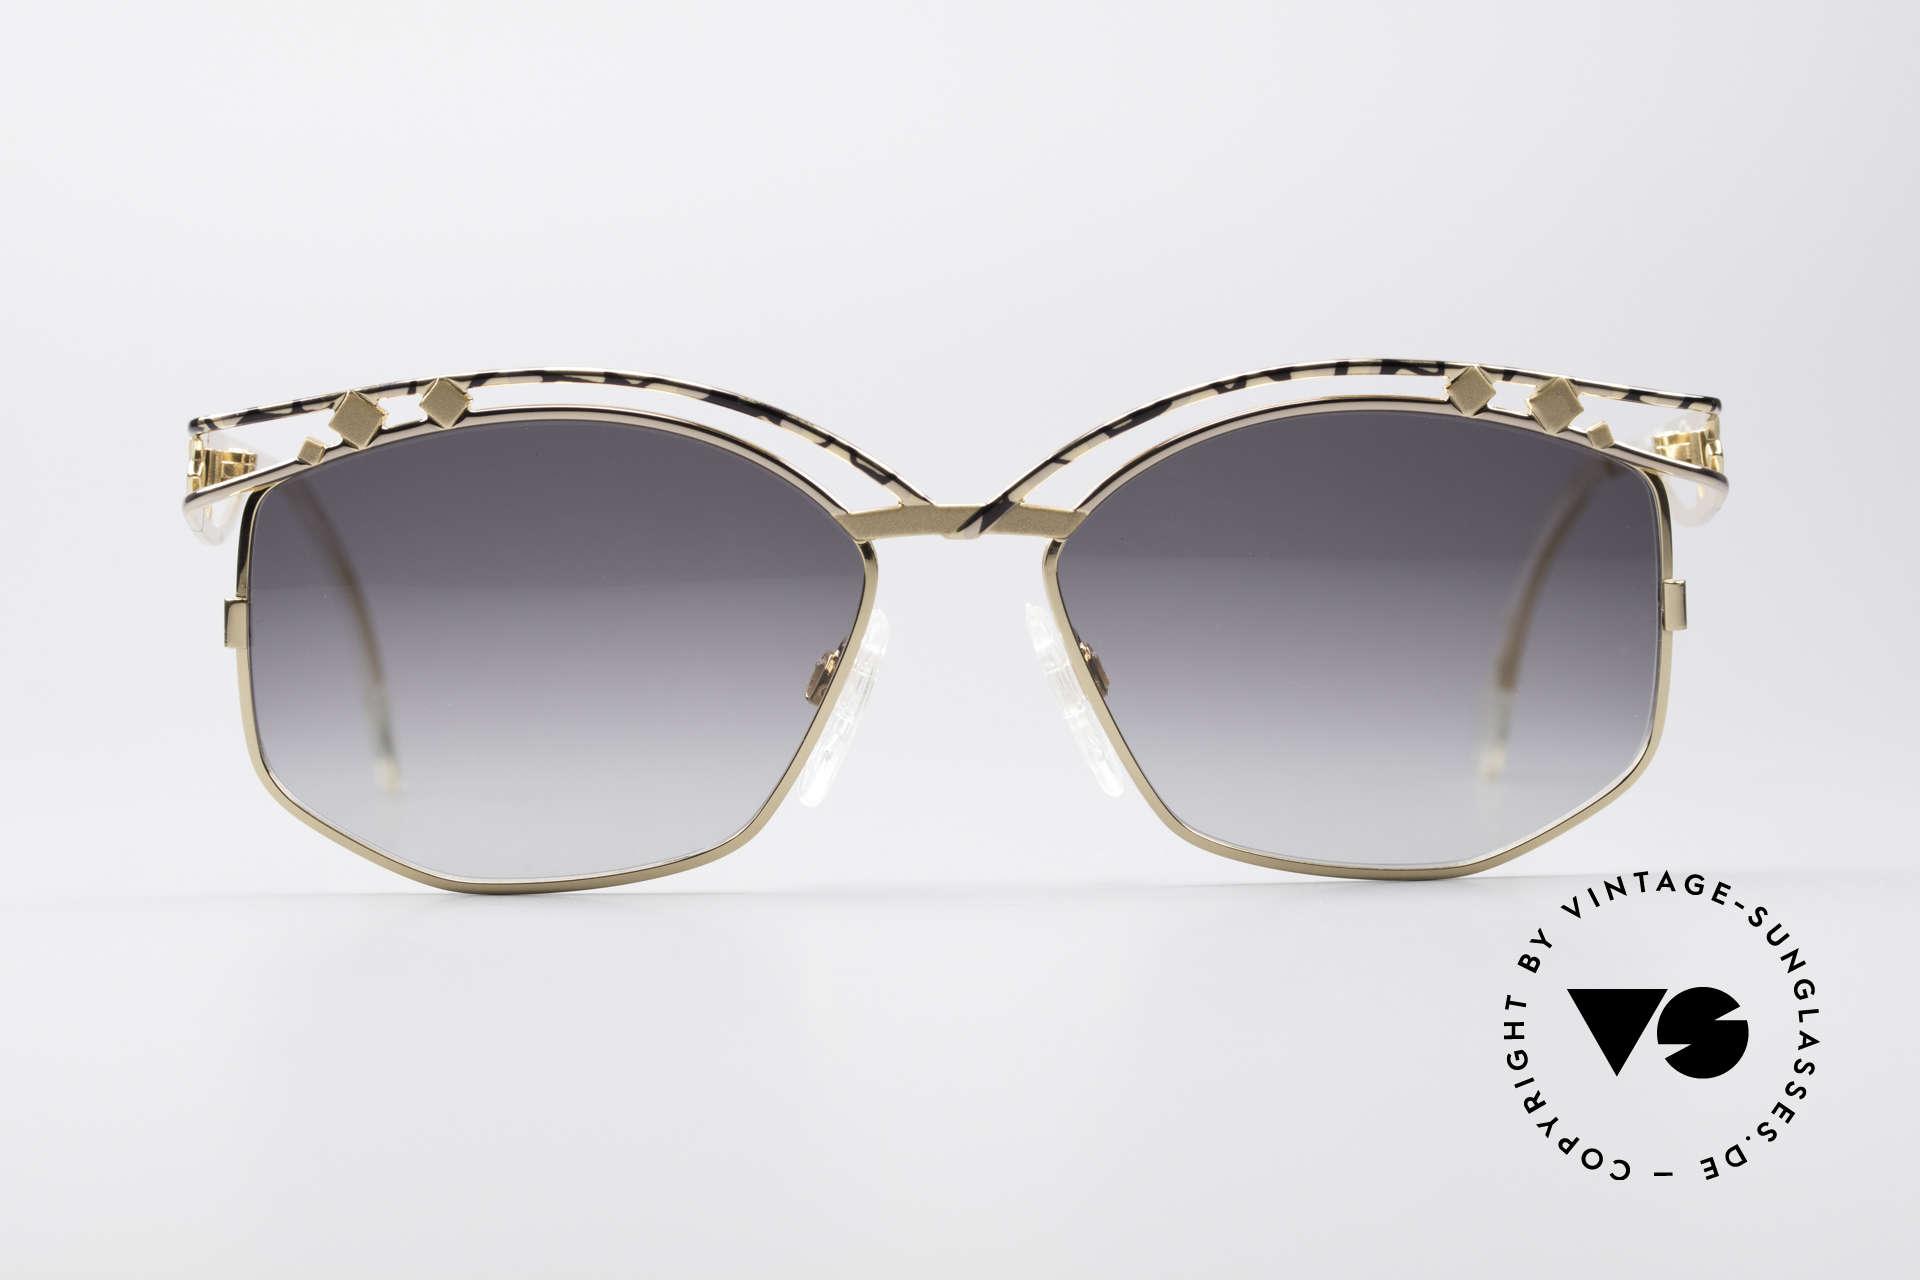 Cazal 280 Rare 90er Damen Sonnenbrille, unverwechelbare CAri ZALloni (CAZAL) Creation, Passend für Damen